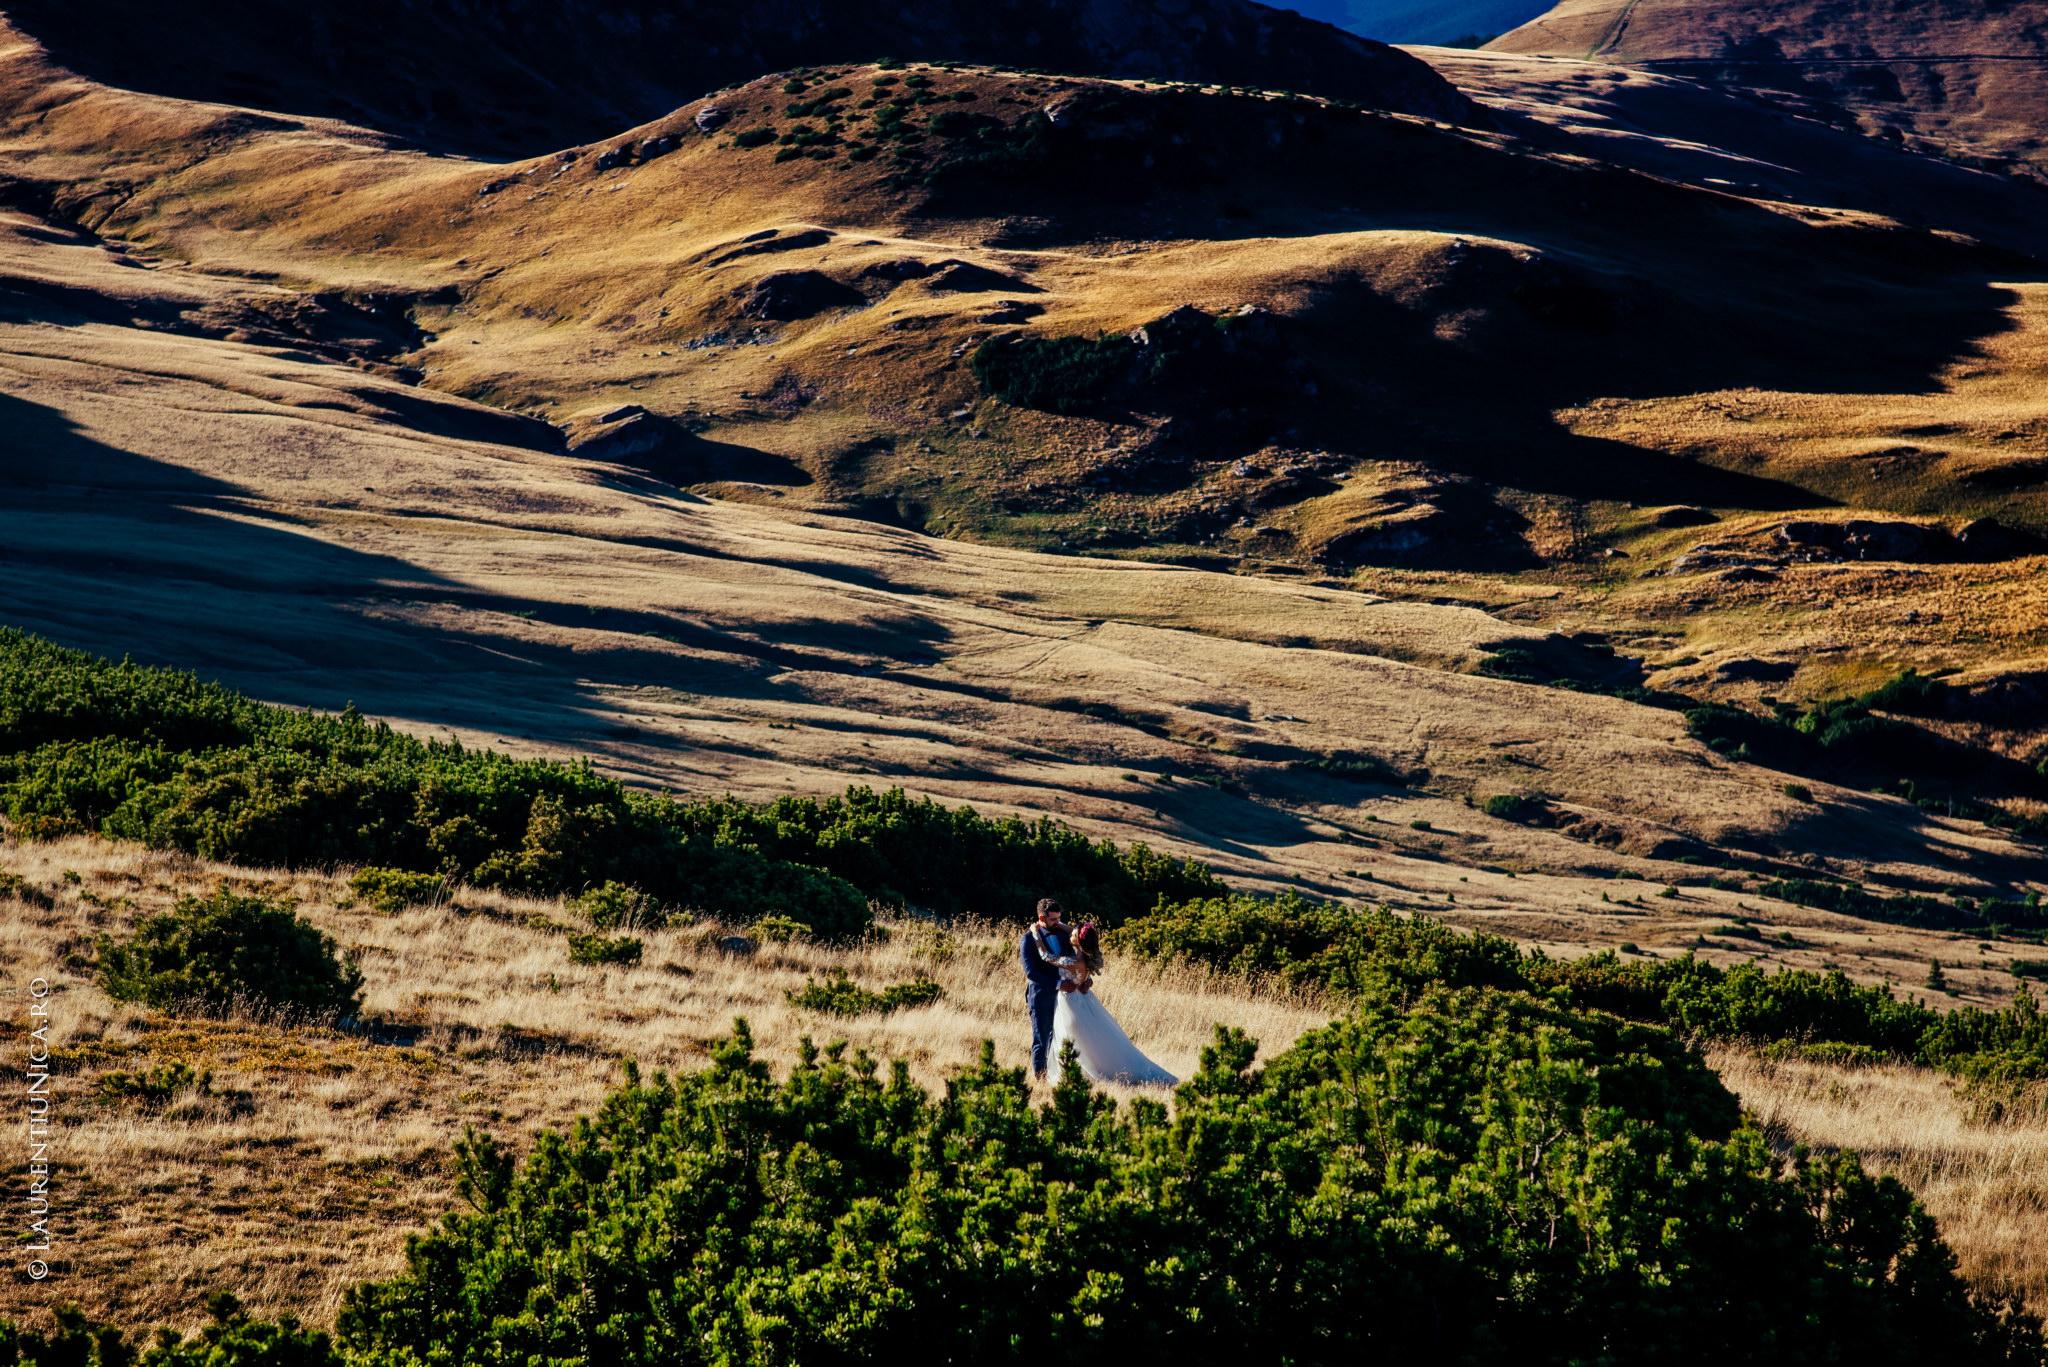 aida si alin fotograf nunta laurentiu nica transalpina 16 - Aida & Alin | Fotografii After Wedding | Transalpina - Muntii Parang